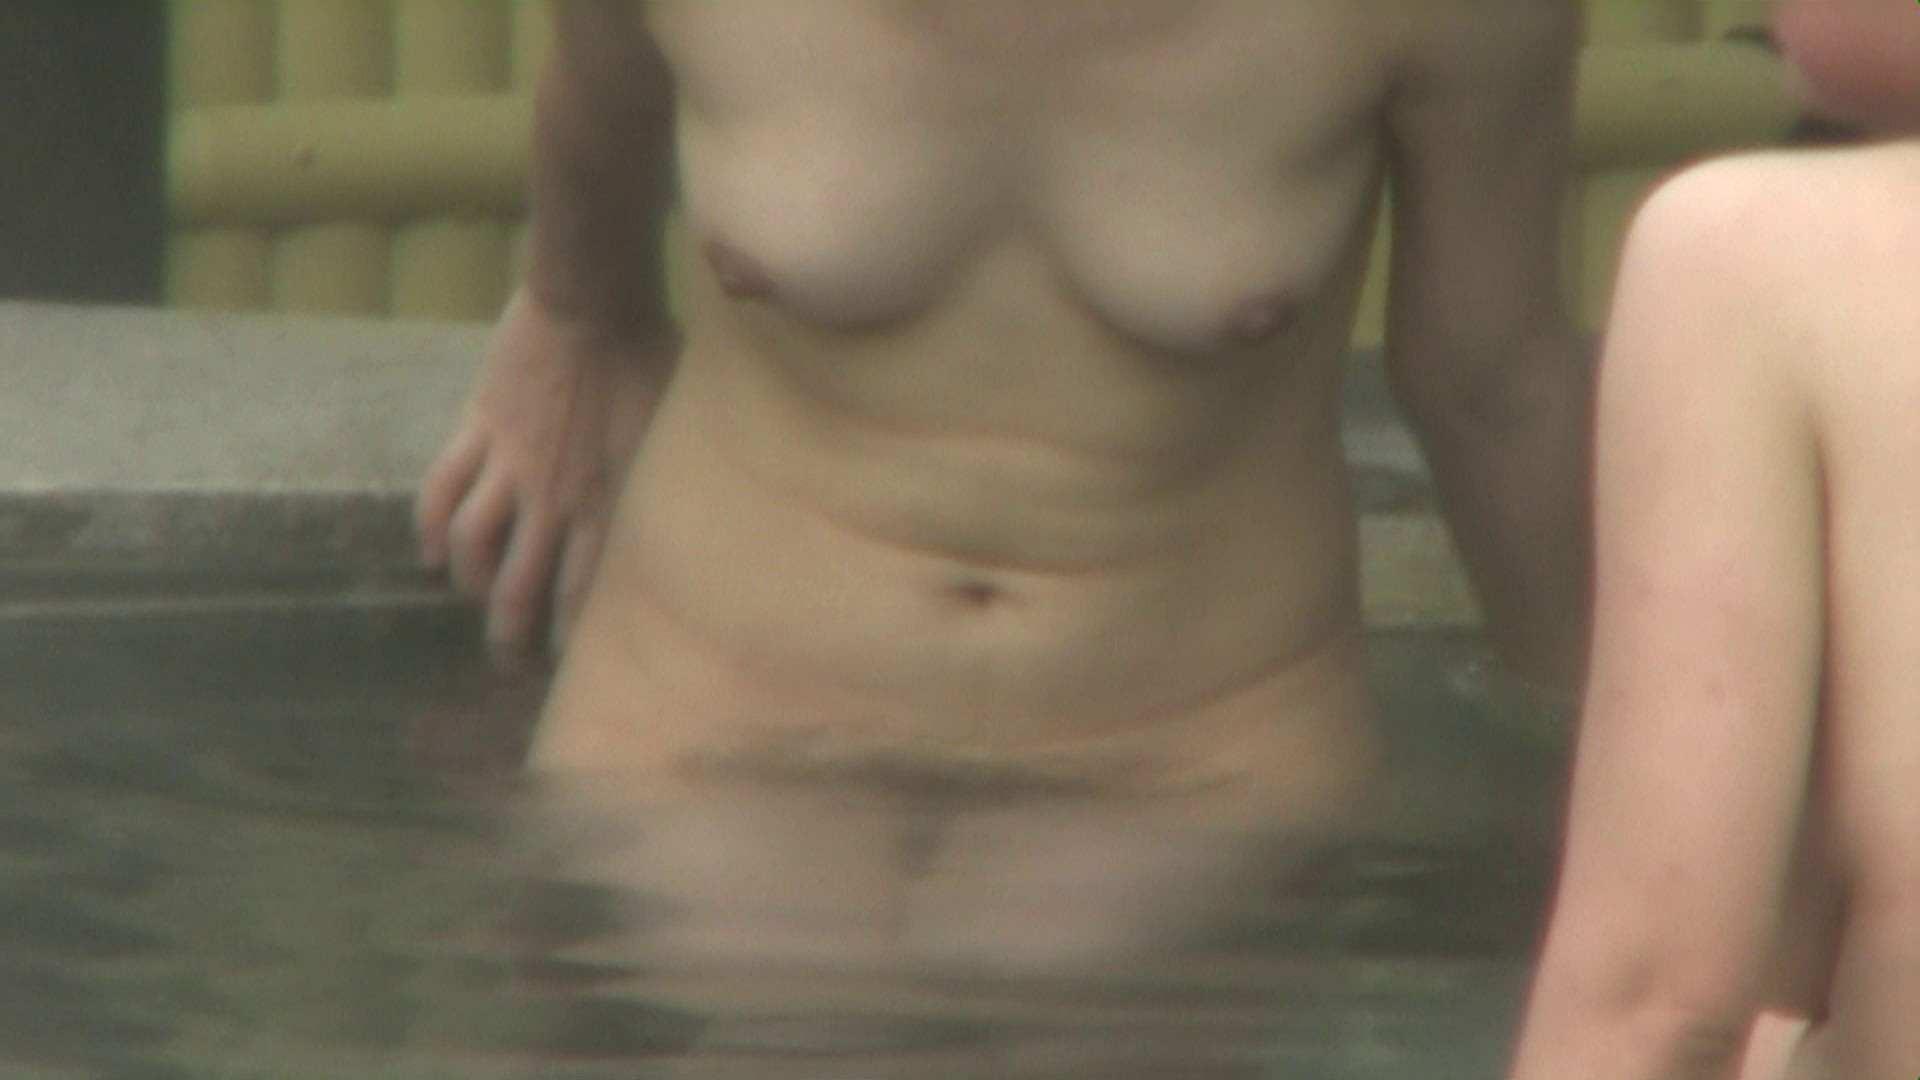 Aquaな露天風呂Vol.74【VIP限定】 OLセックス  68画像 48